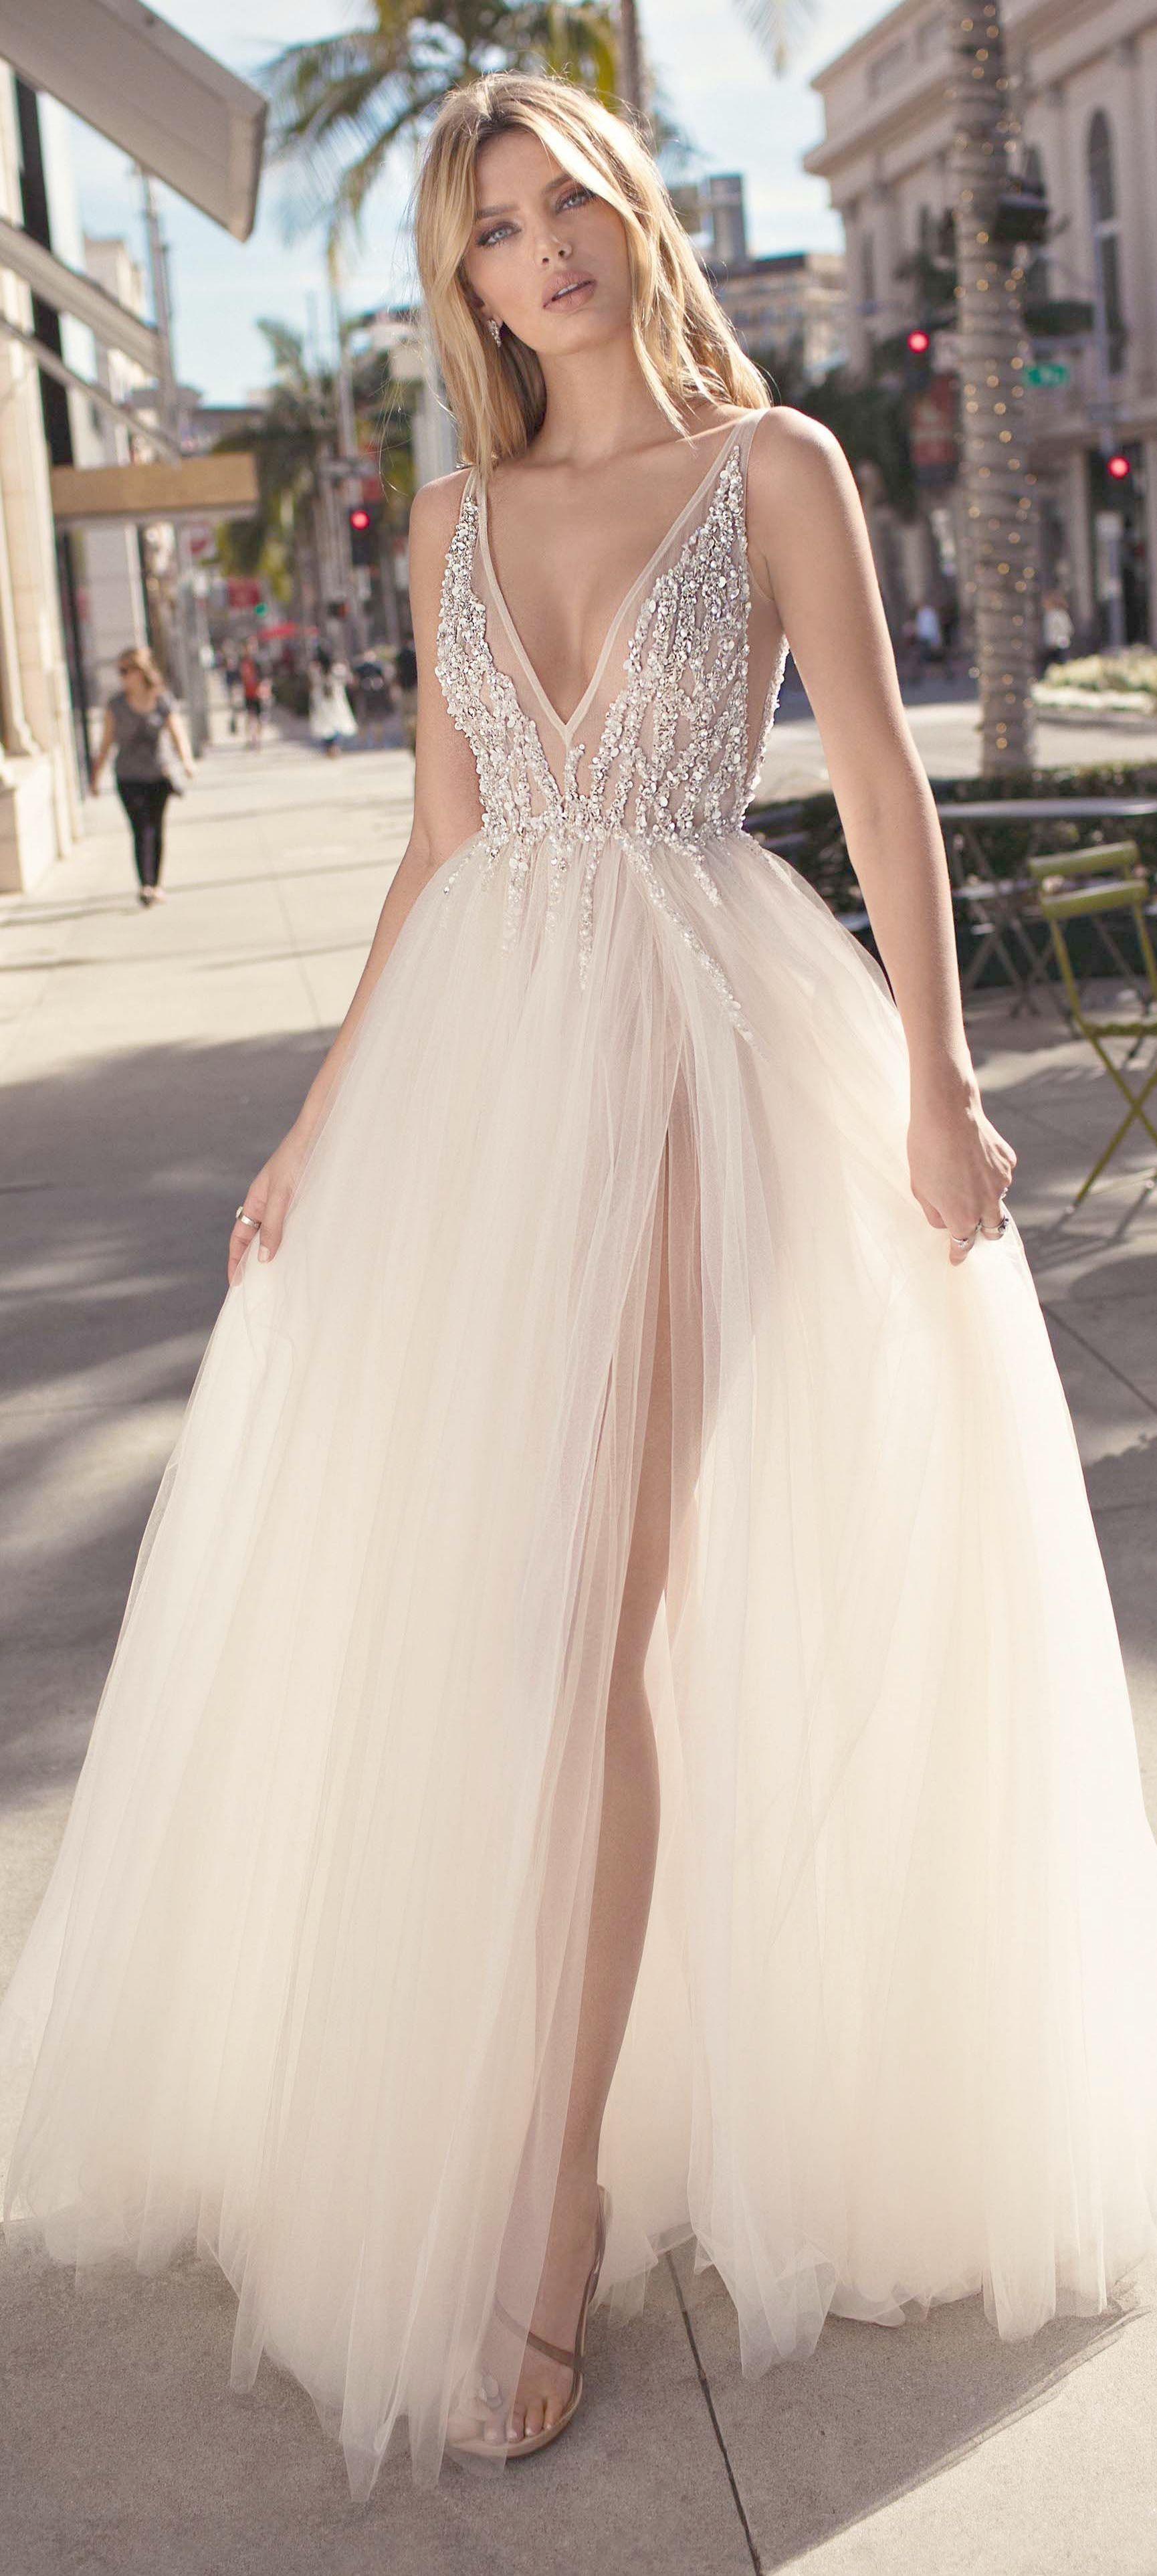 Best formal dresses for large bust considering summer